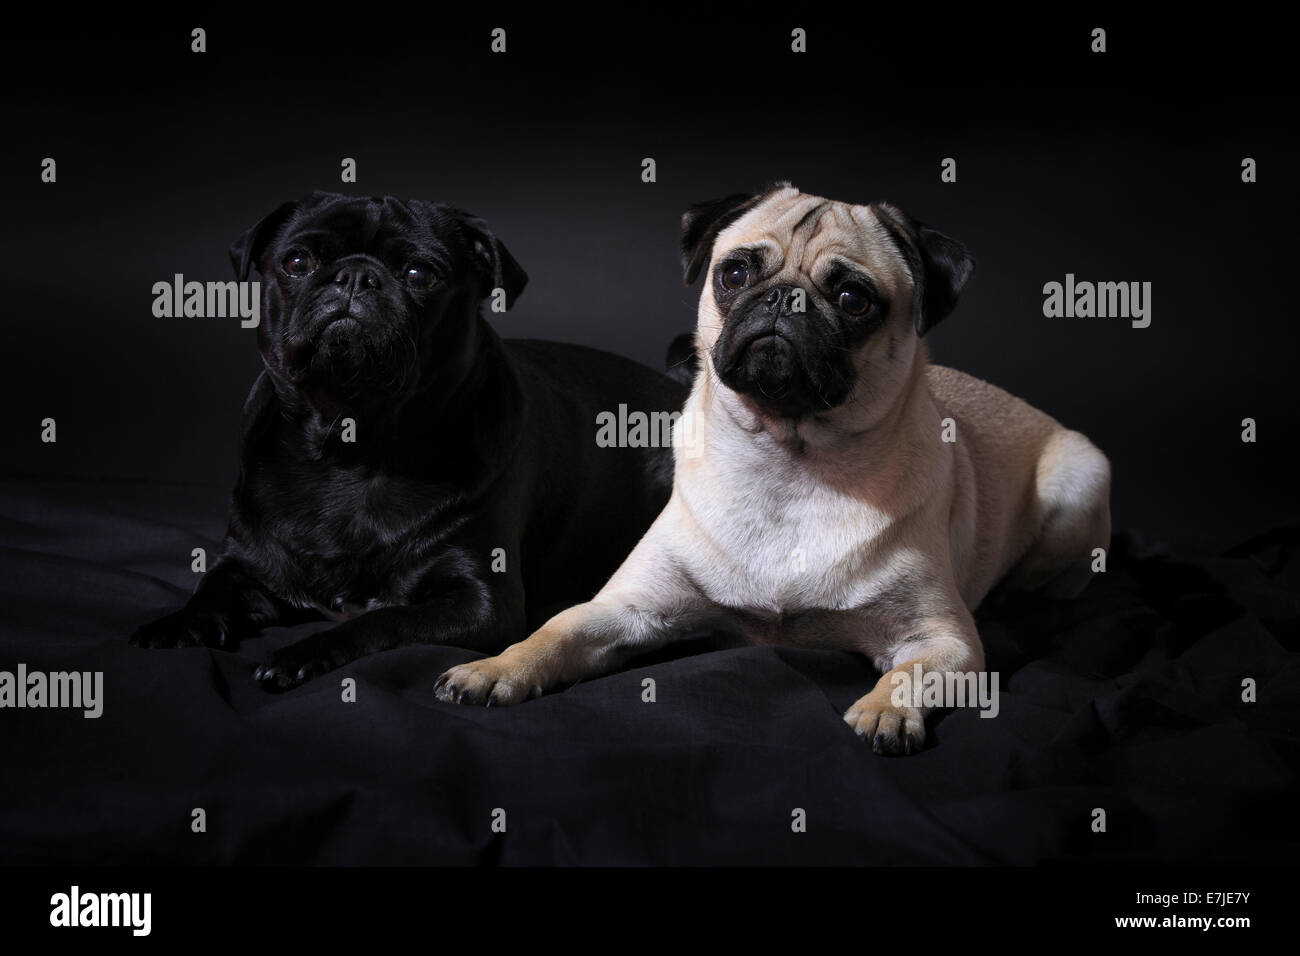 2, domestic animal, pet, dog, dogs, pugs, fatties, mops, pugs, fatties, pair, couple, portrait, couple, four-legged, - Stock Image